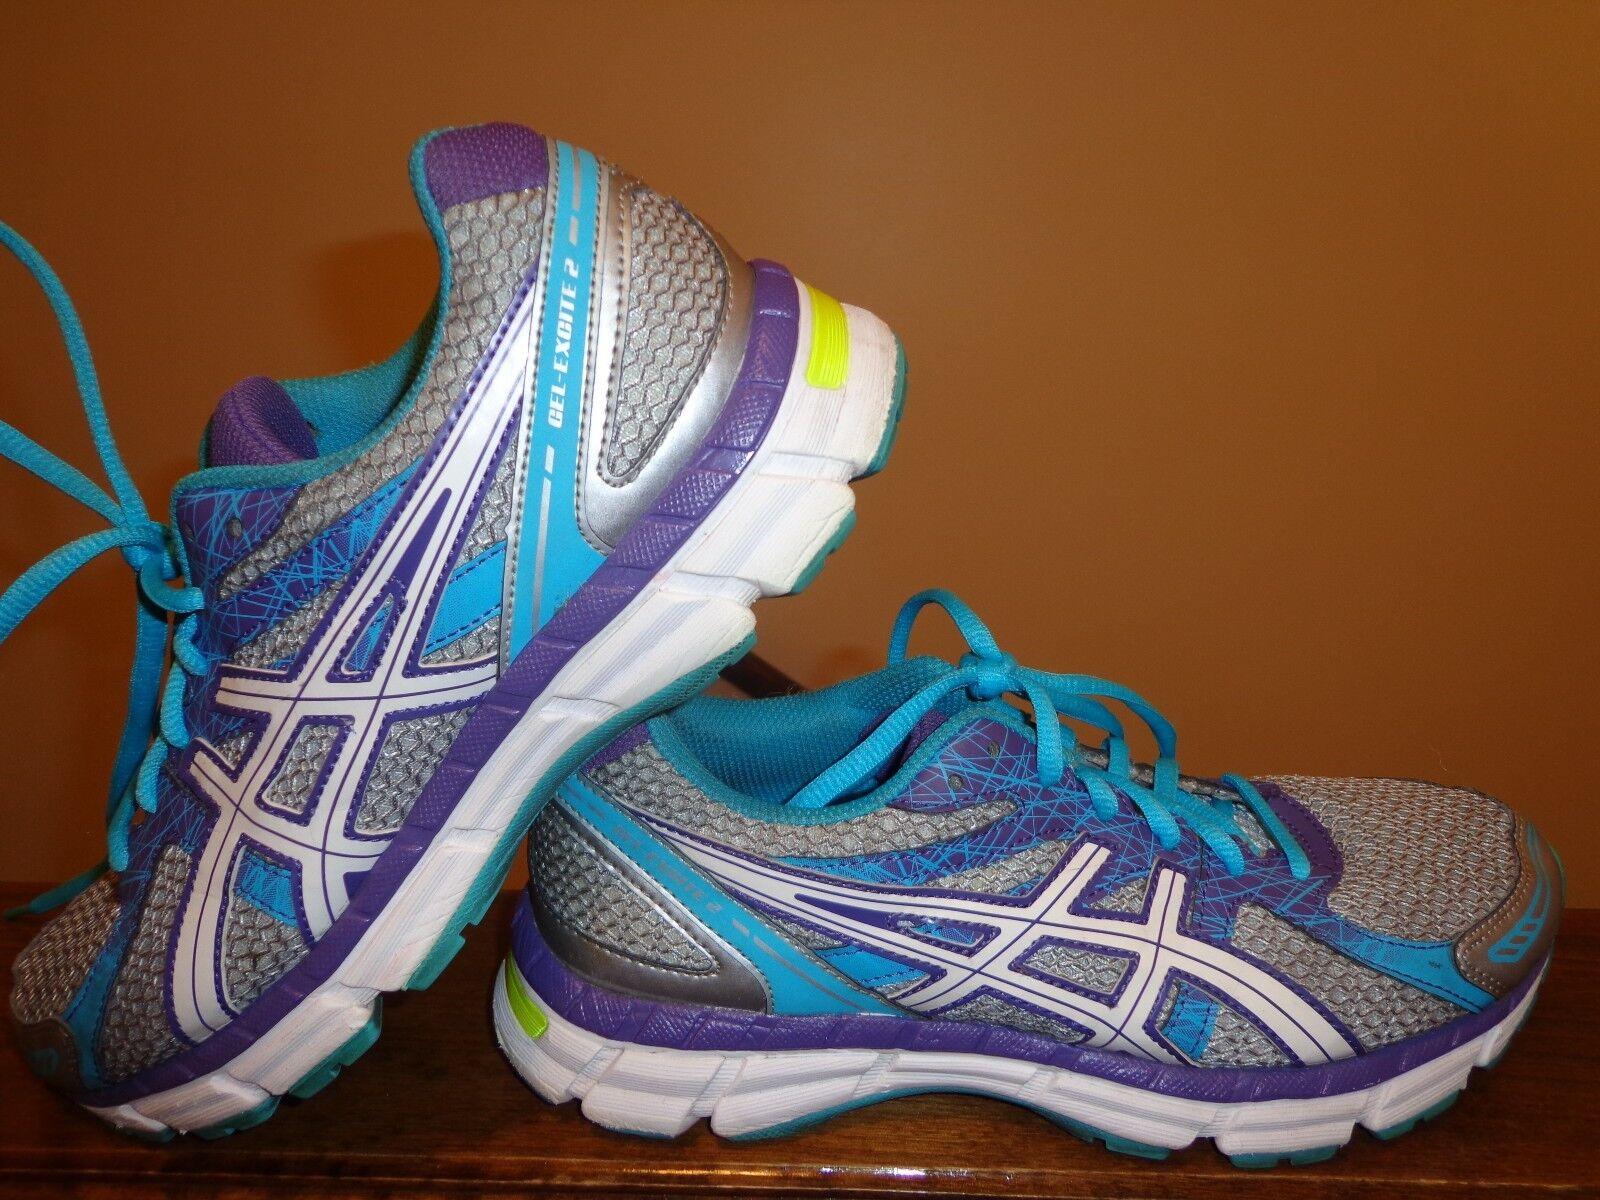 Asics Gel-Excite-2 Athletic Women's shoes Multi-color US-Size 8.5